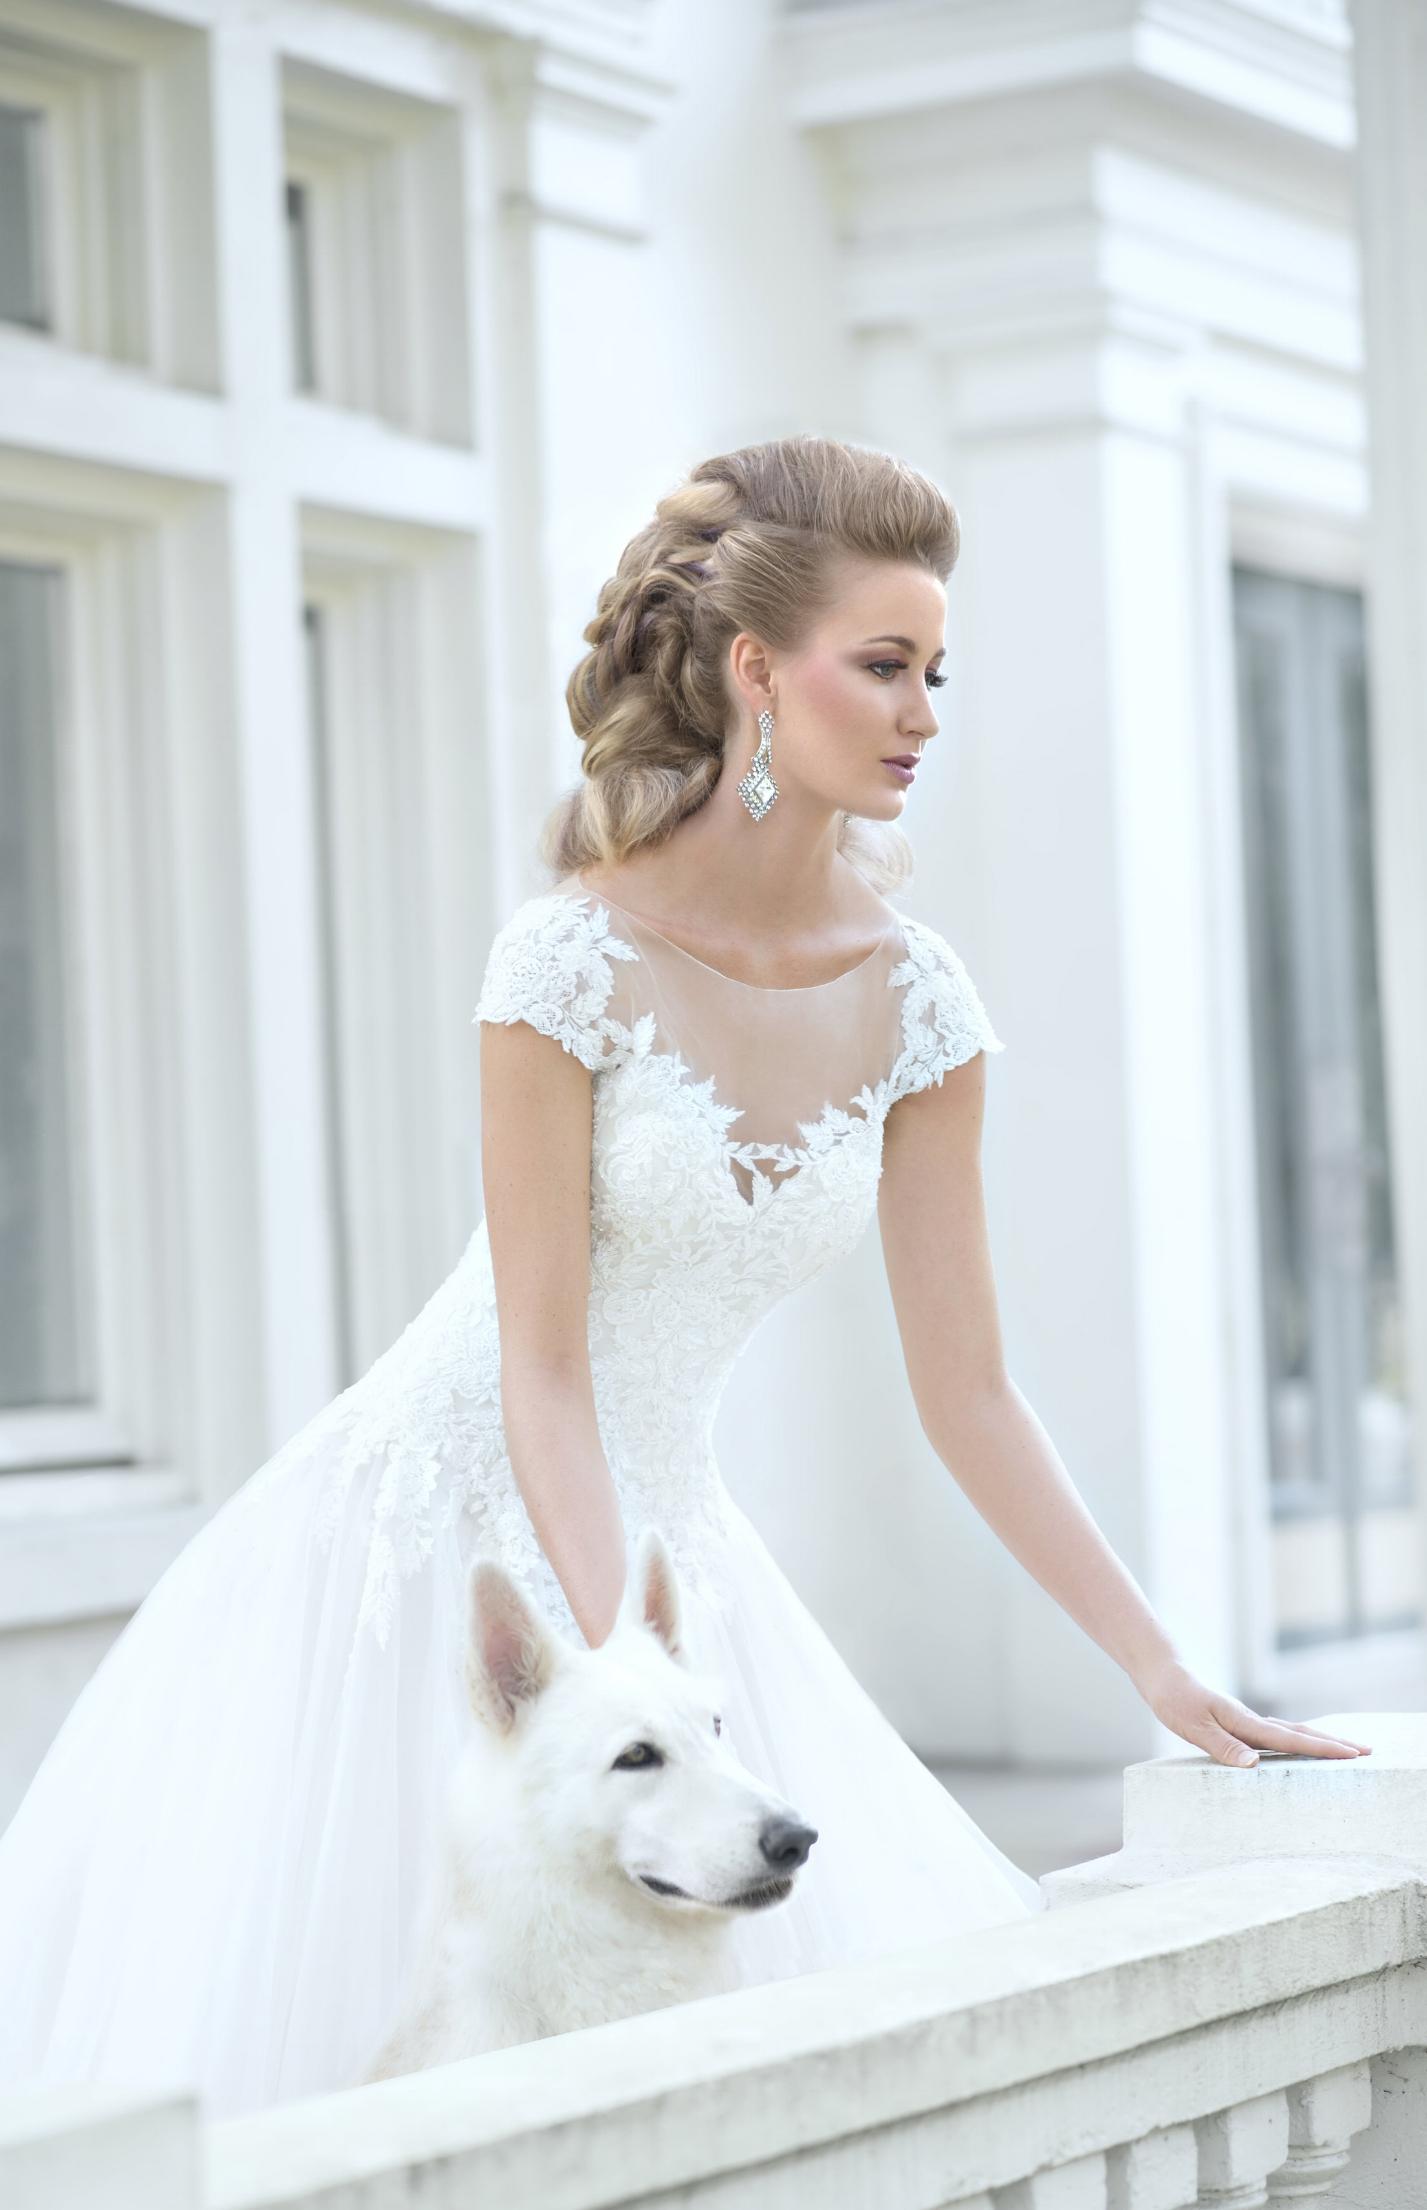 bredicebeautywedding_nyc_sav_ga_atl_nc_italy_paris_DSC_4944B_r2.jpg